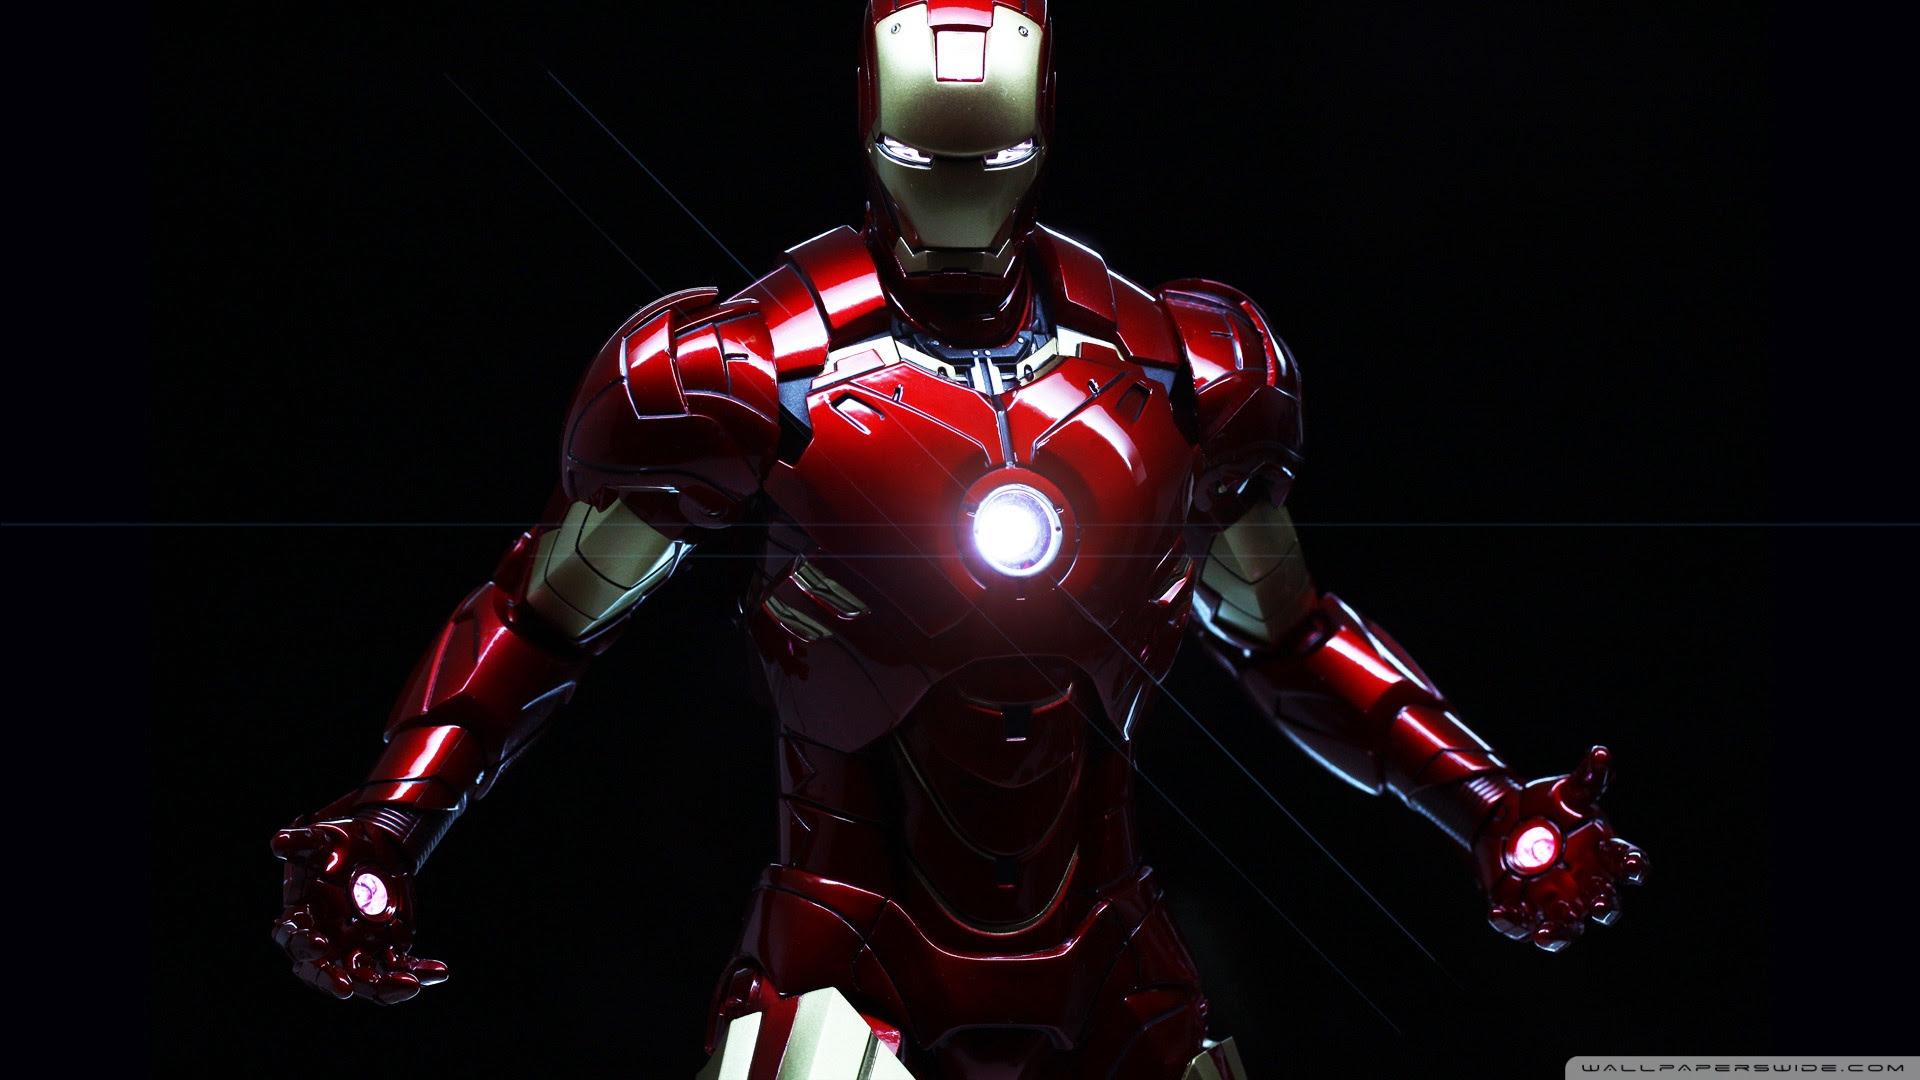 Wallpaper Hd Iron Man Desktop Wallpaper 4k